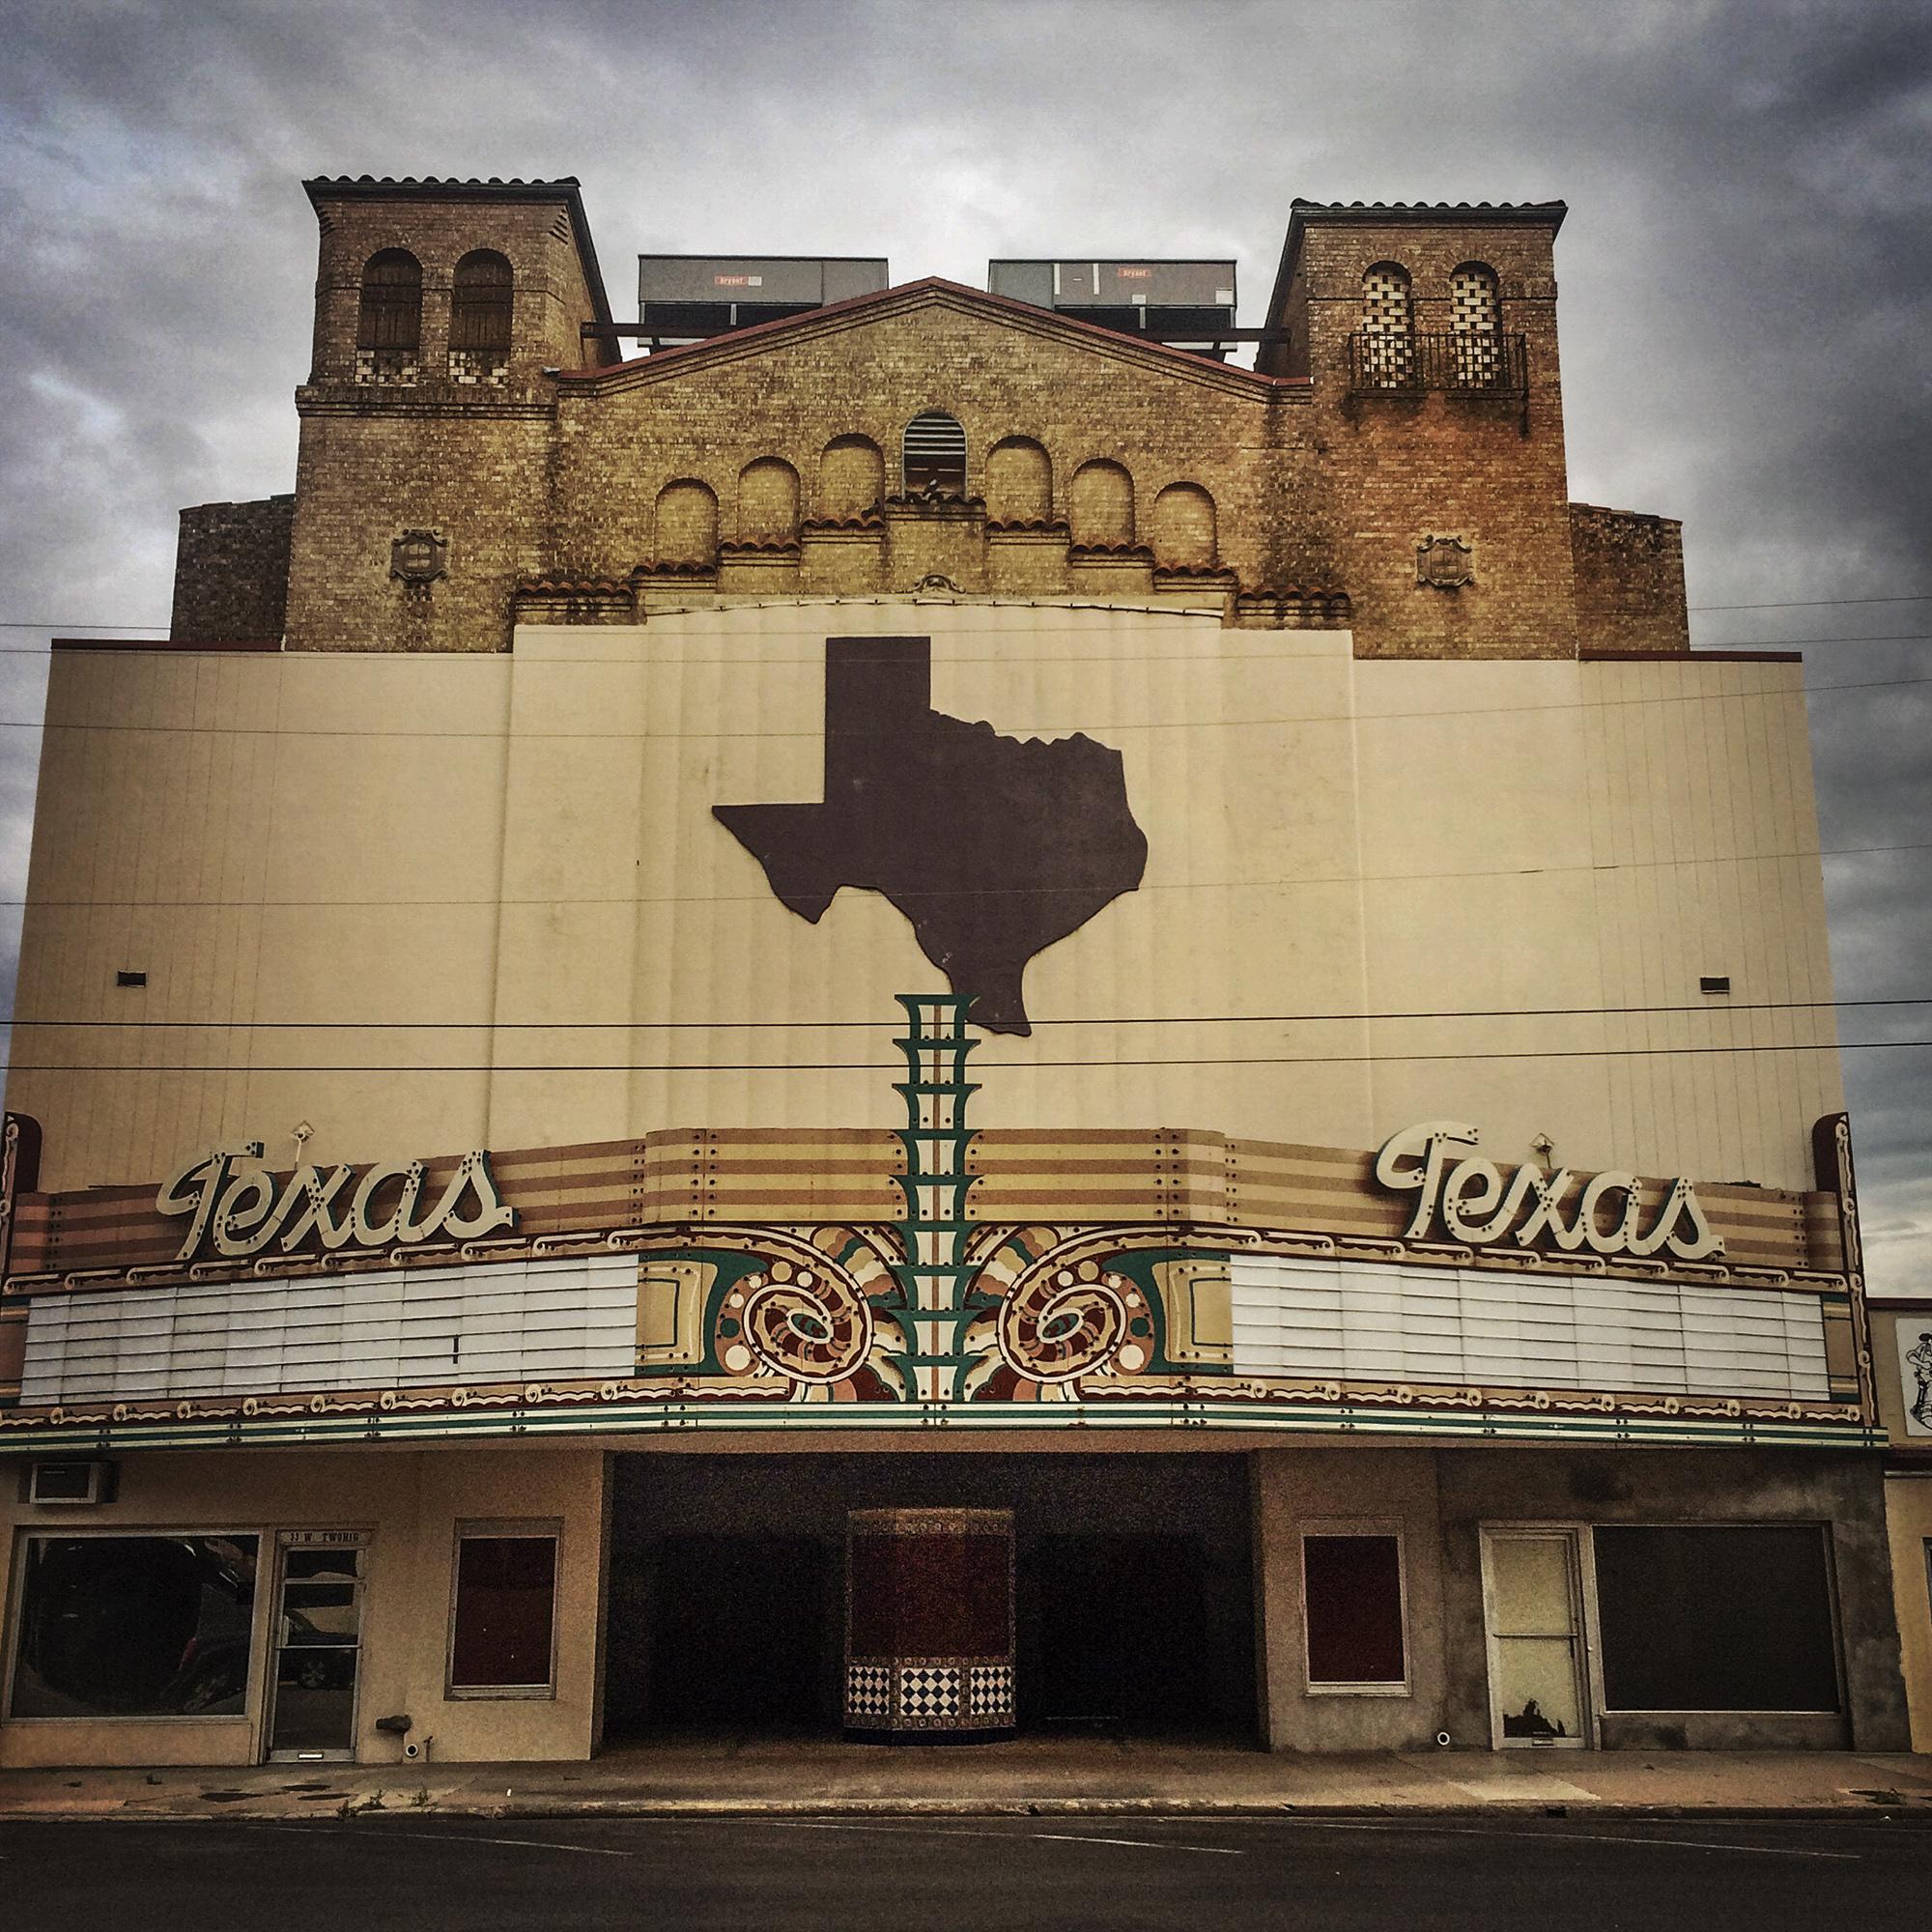 Texas Theater, San Angelo, Texas, 2015